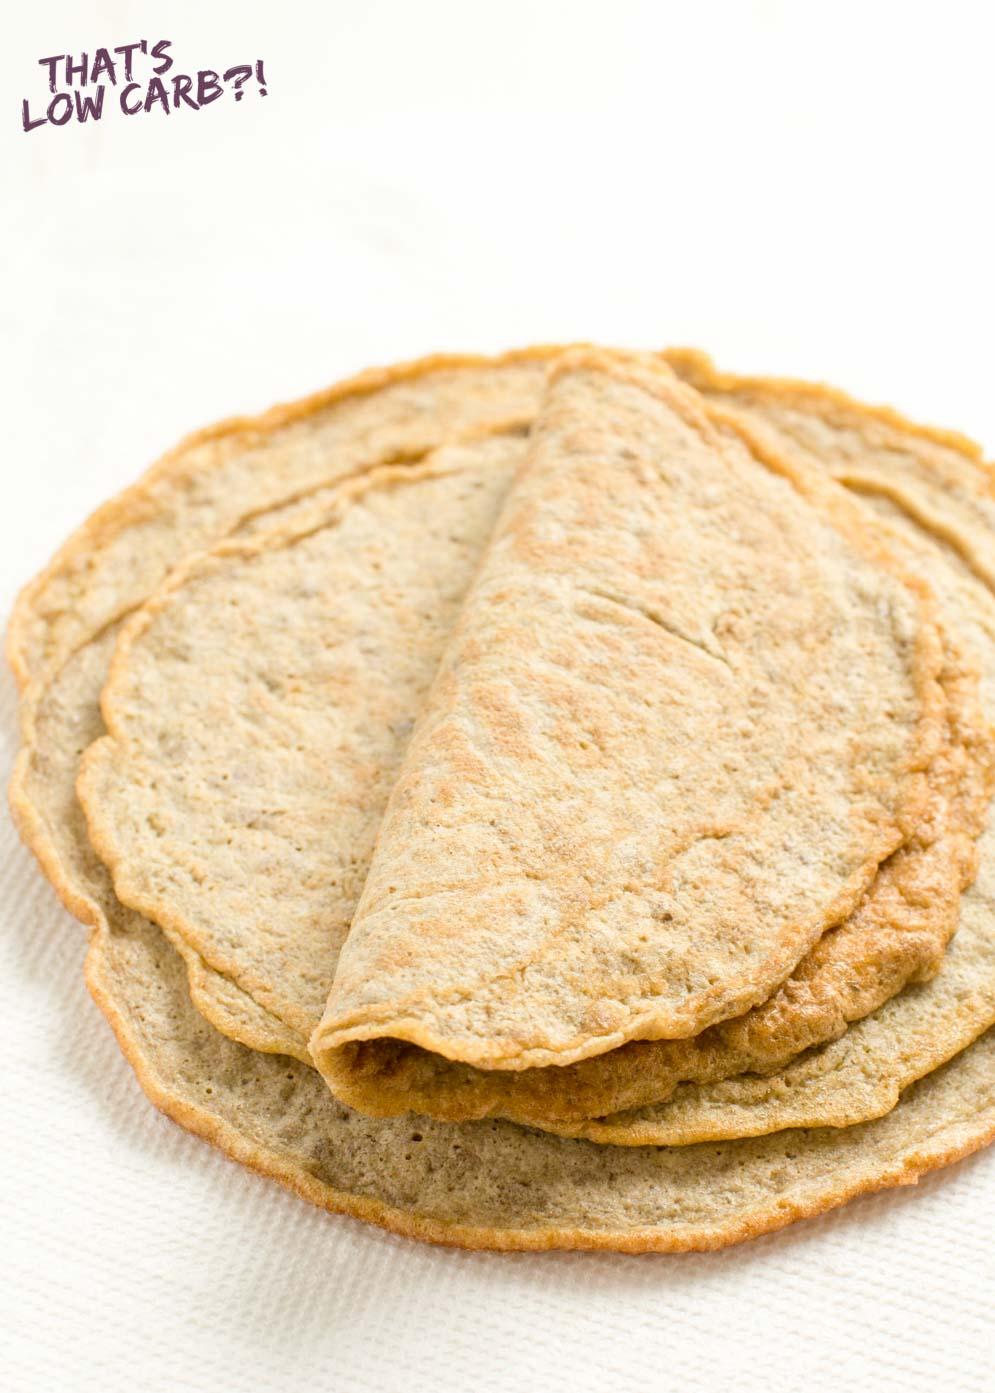 Low Carb Tortillas Recipe